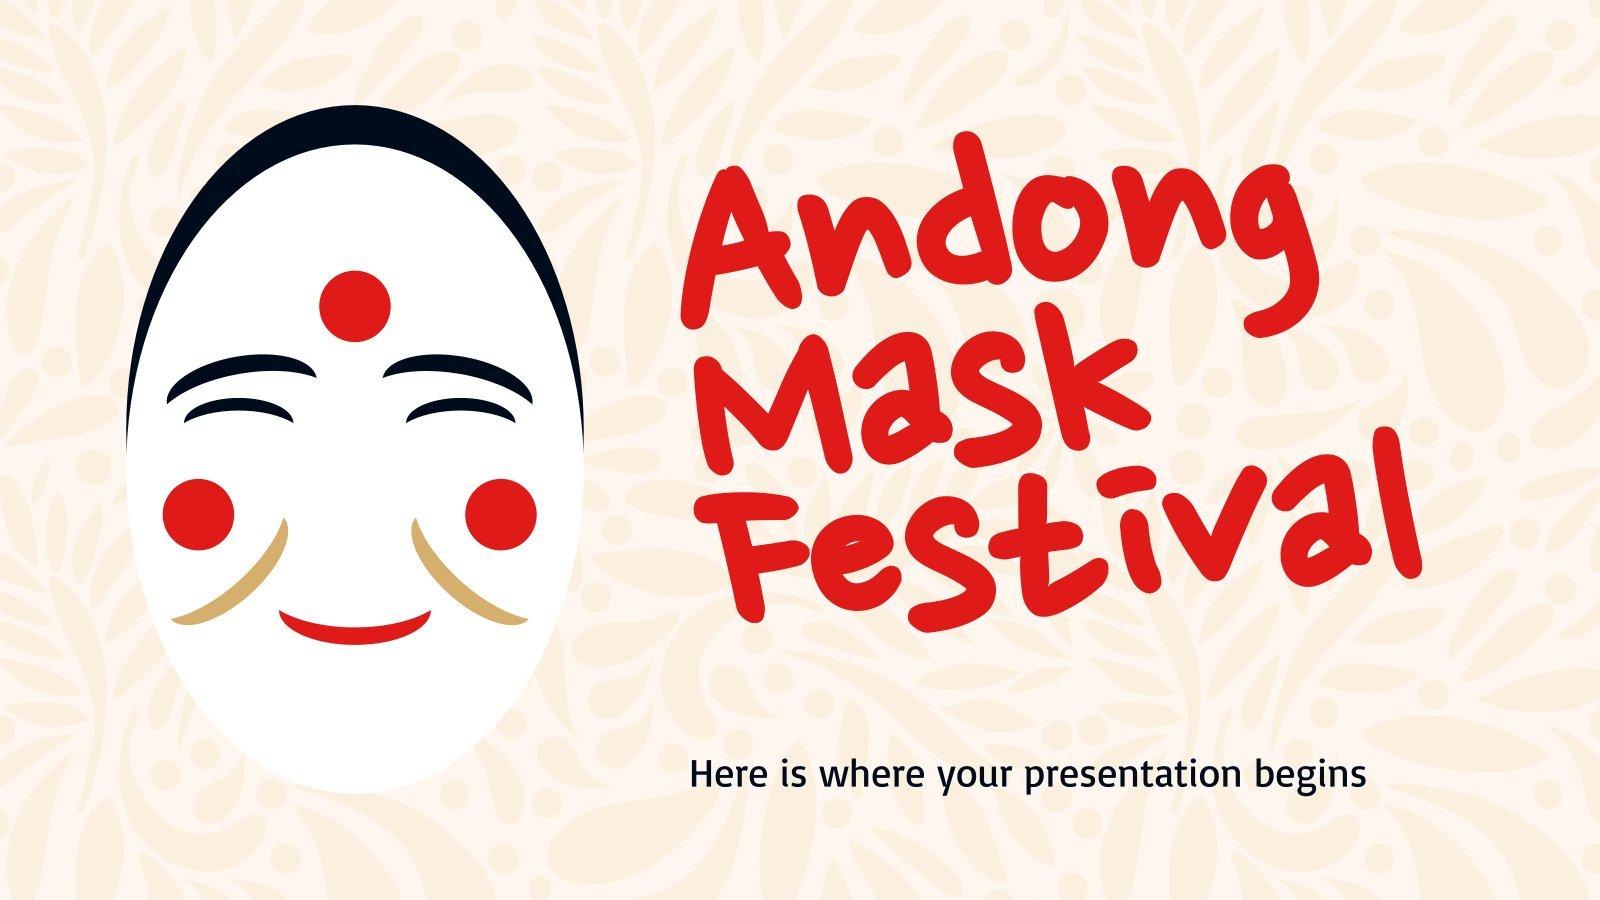 Plantilla de presentación Festival de Danza de Máscaras de Andong